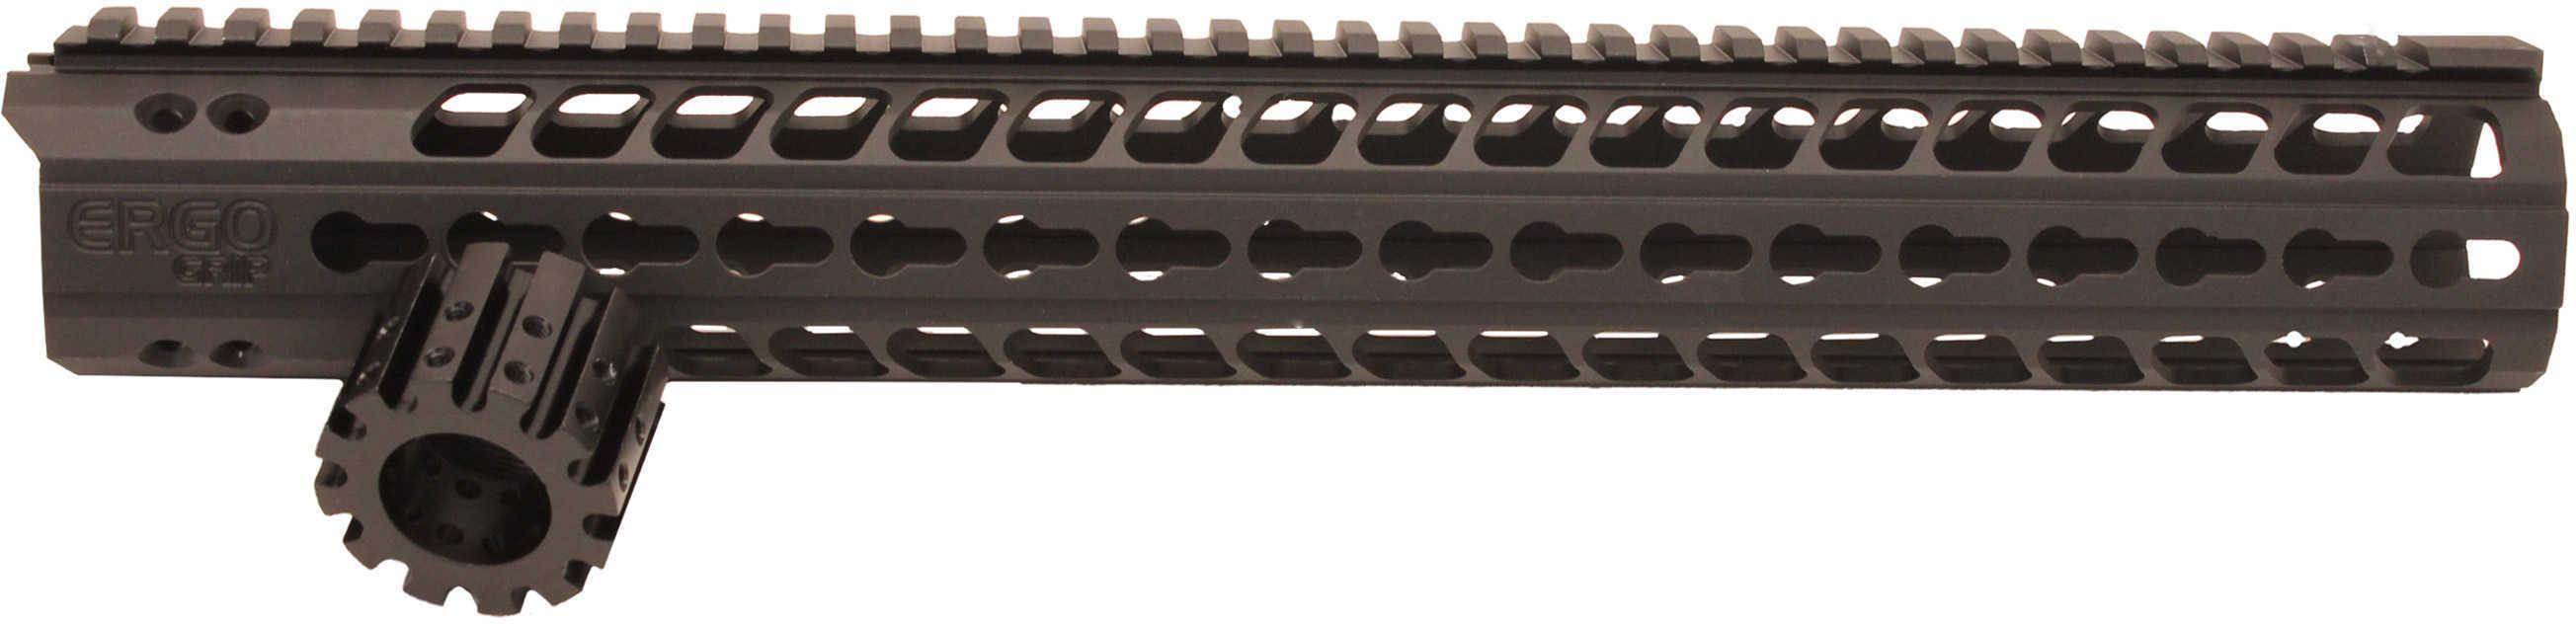 "Ergo KeyMod AR-15 Rail System 15"" Md: 4817-15"